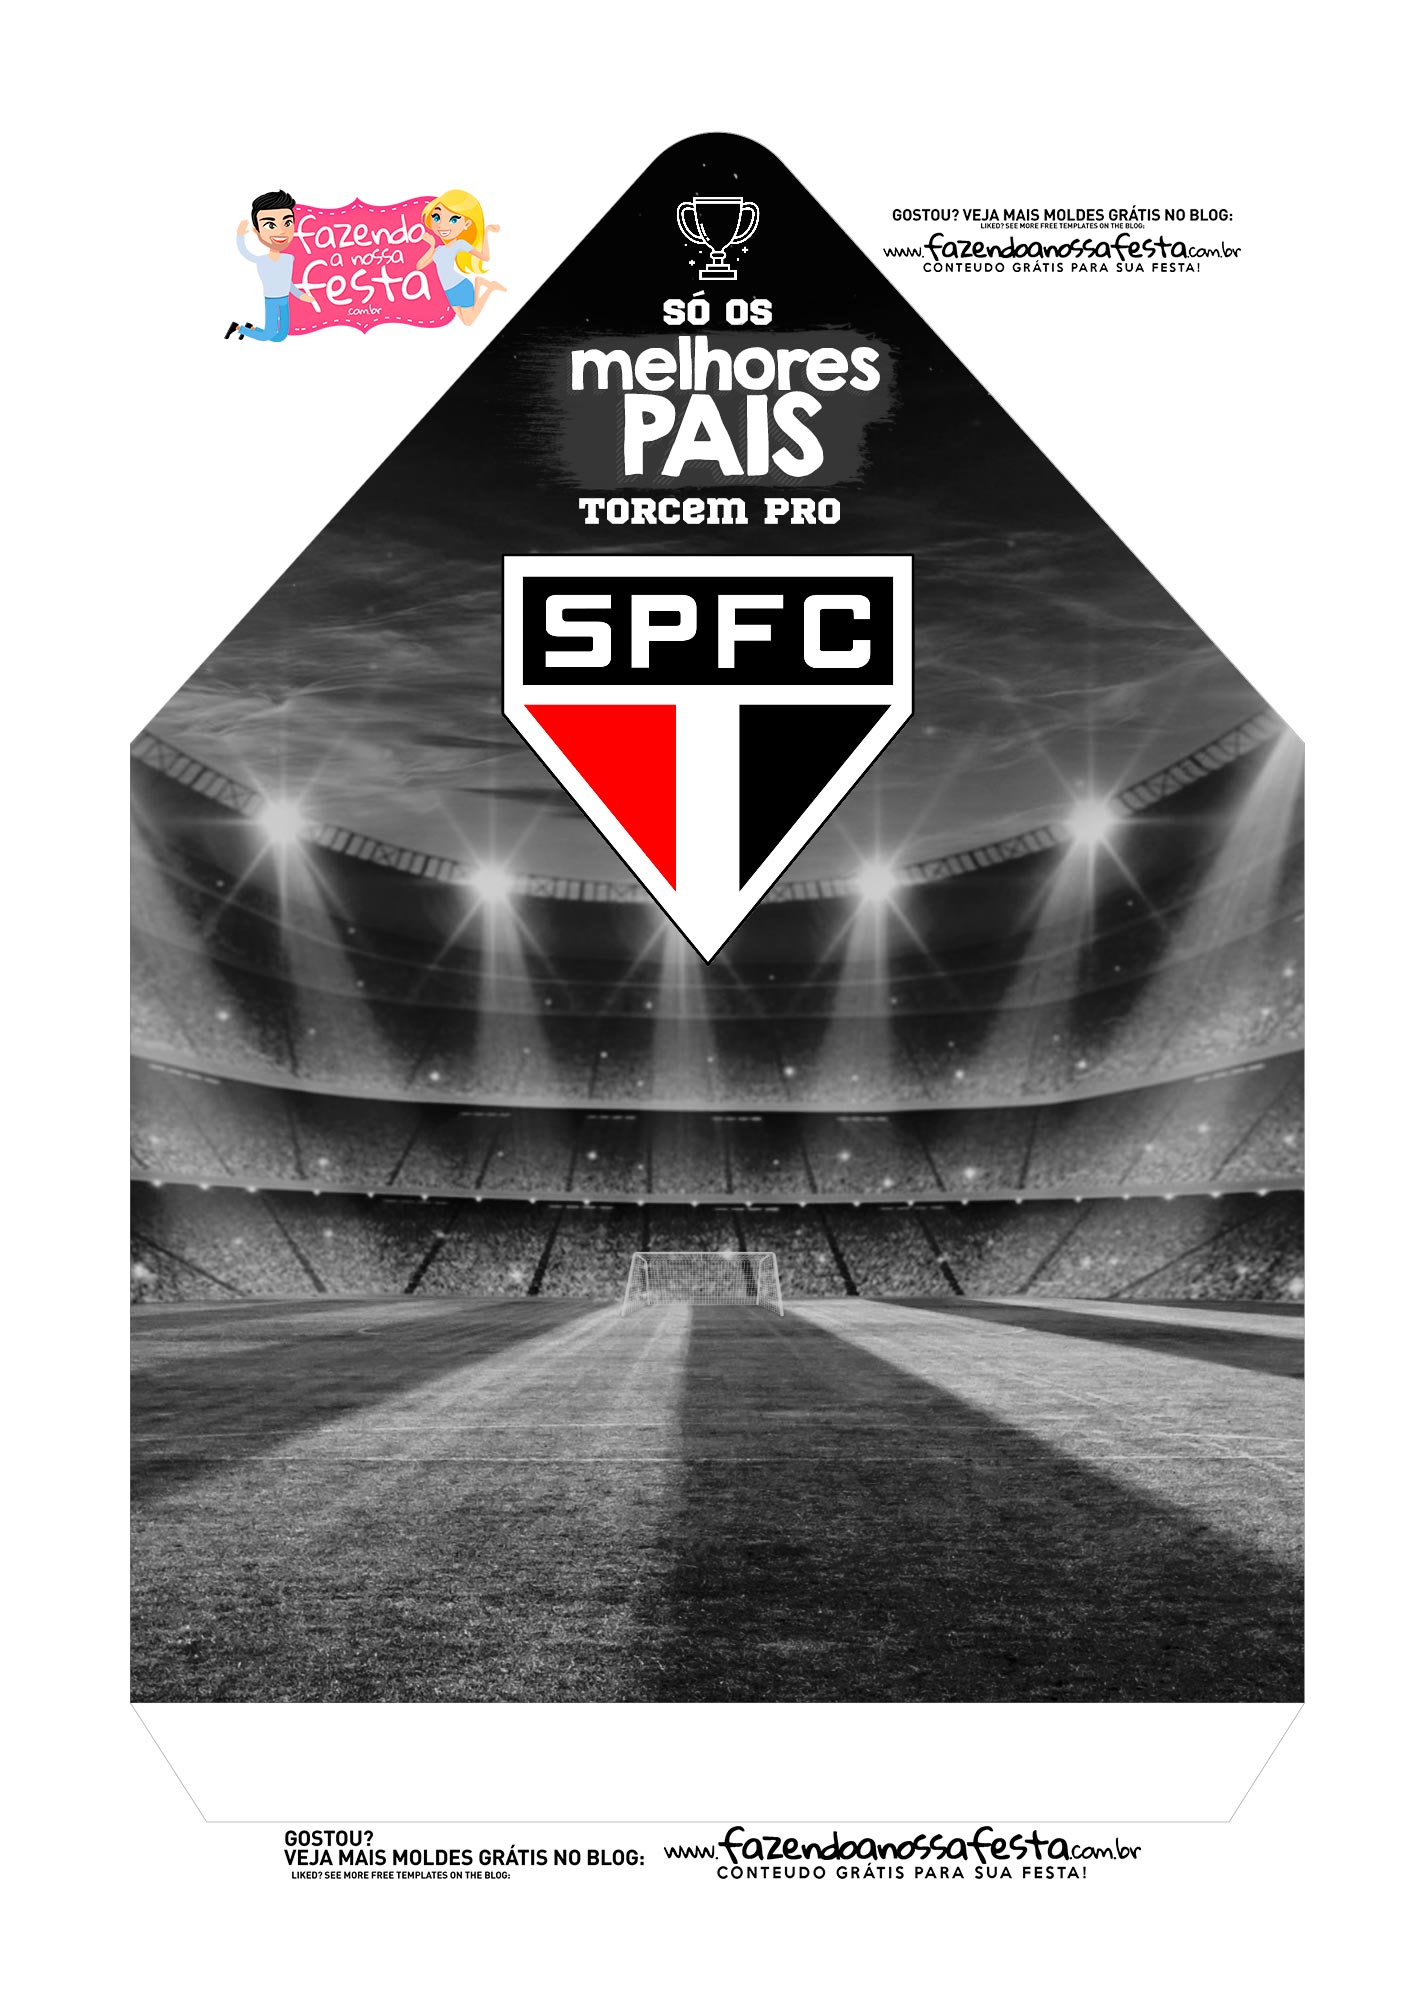 Caixa Envelope Pai Sao Paulo 2